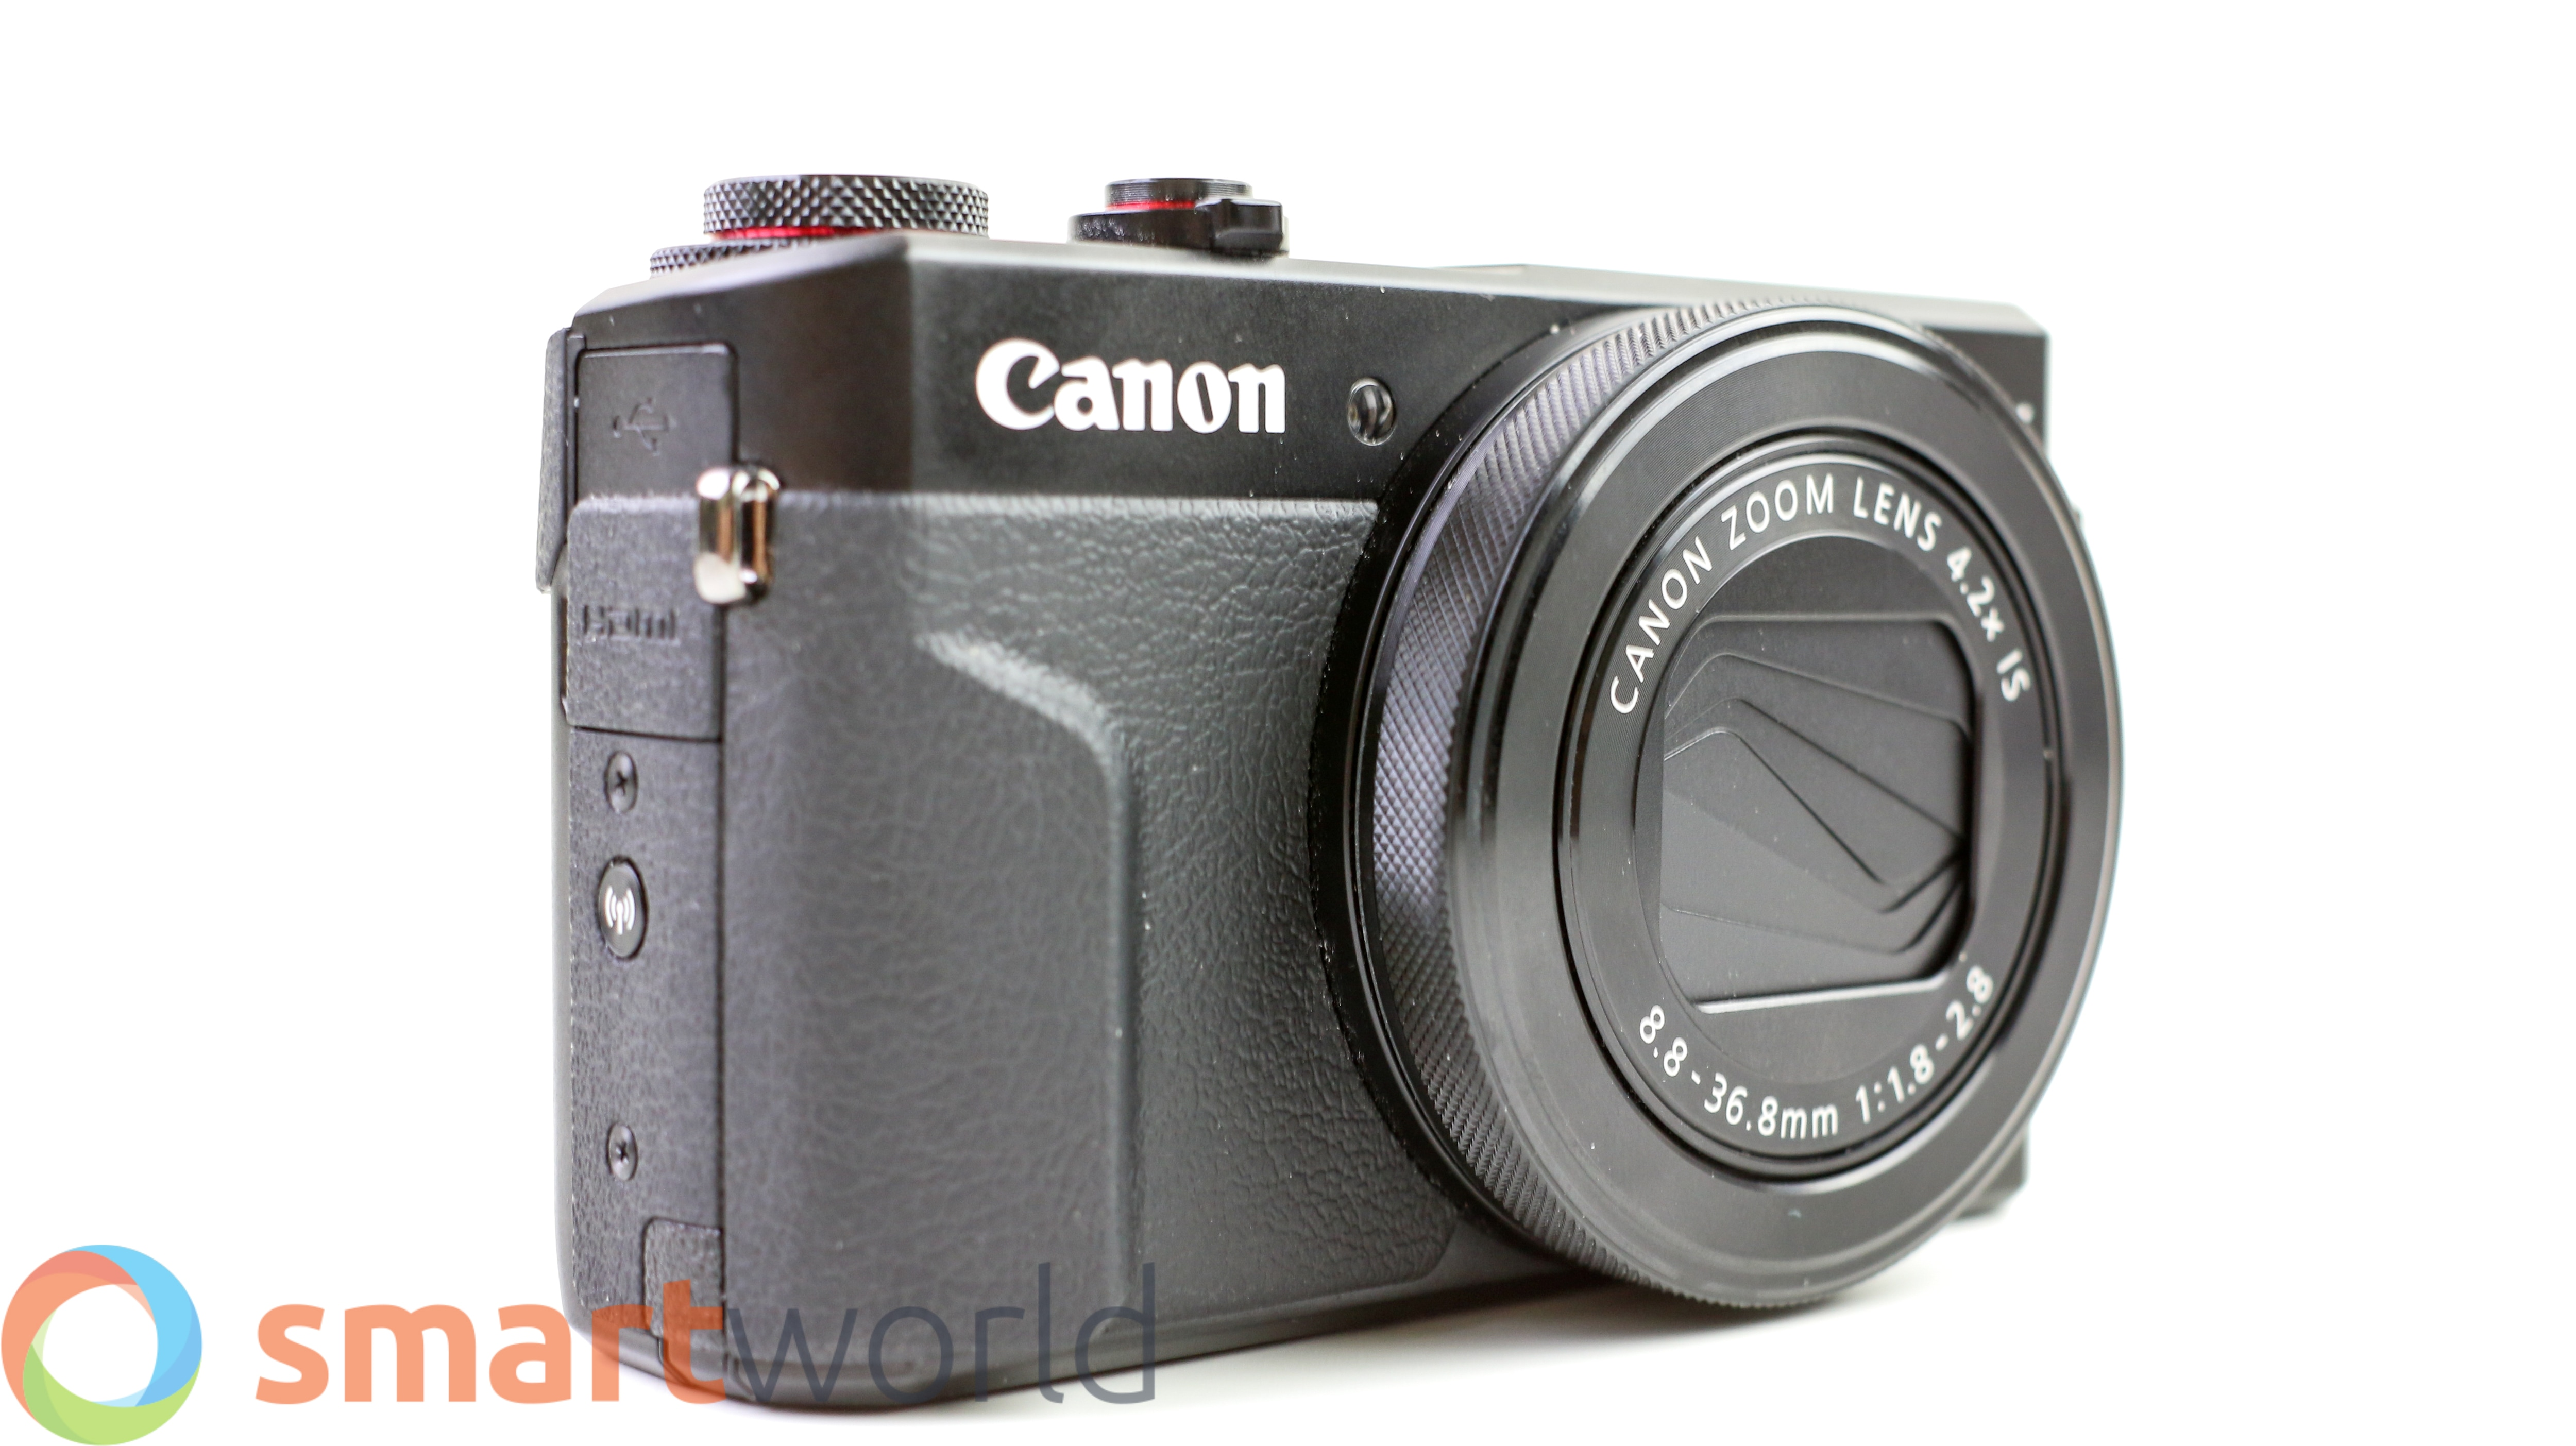 Recensione canon powershot g7 x mark ii foto video for Recensioni h2o power x